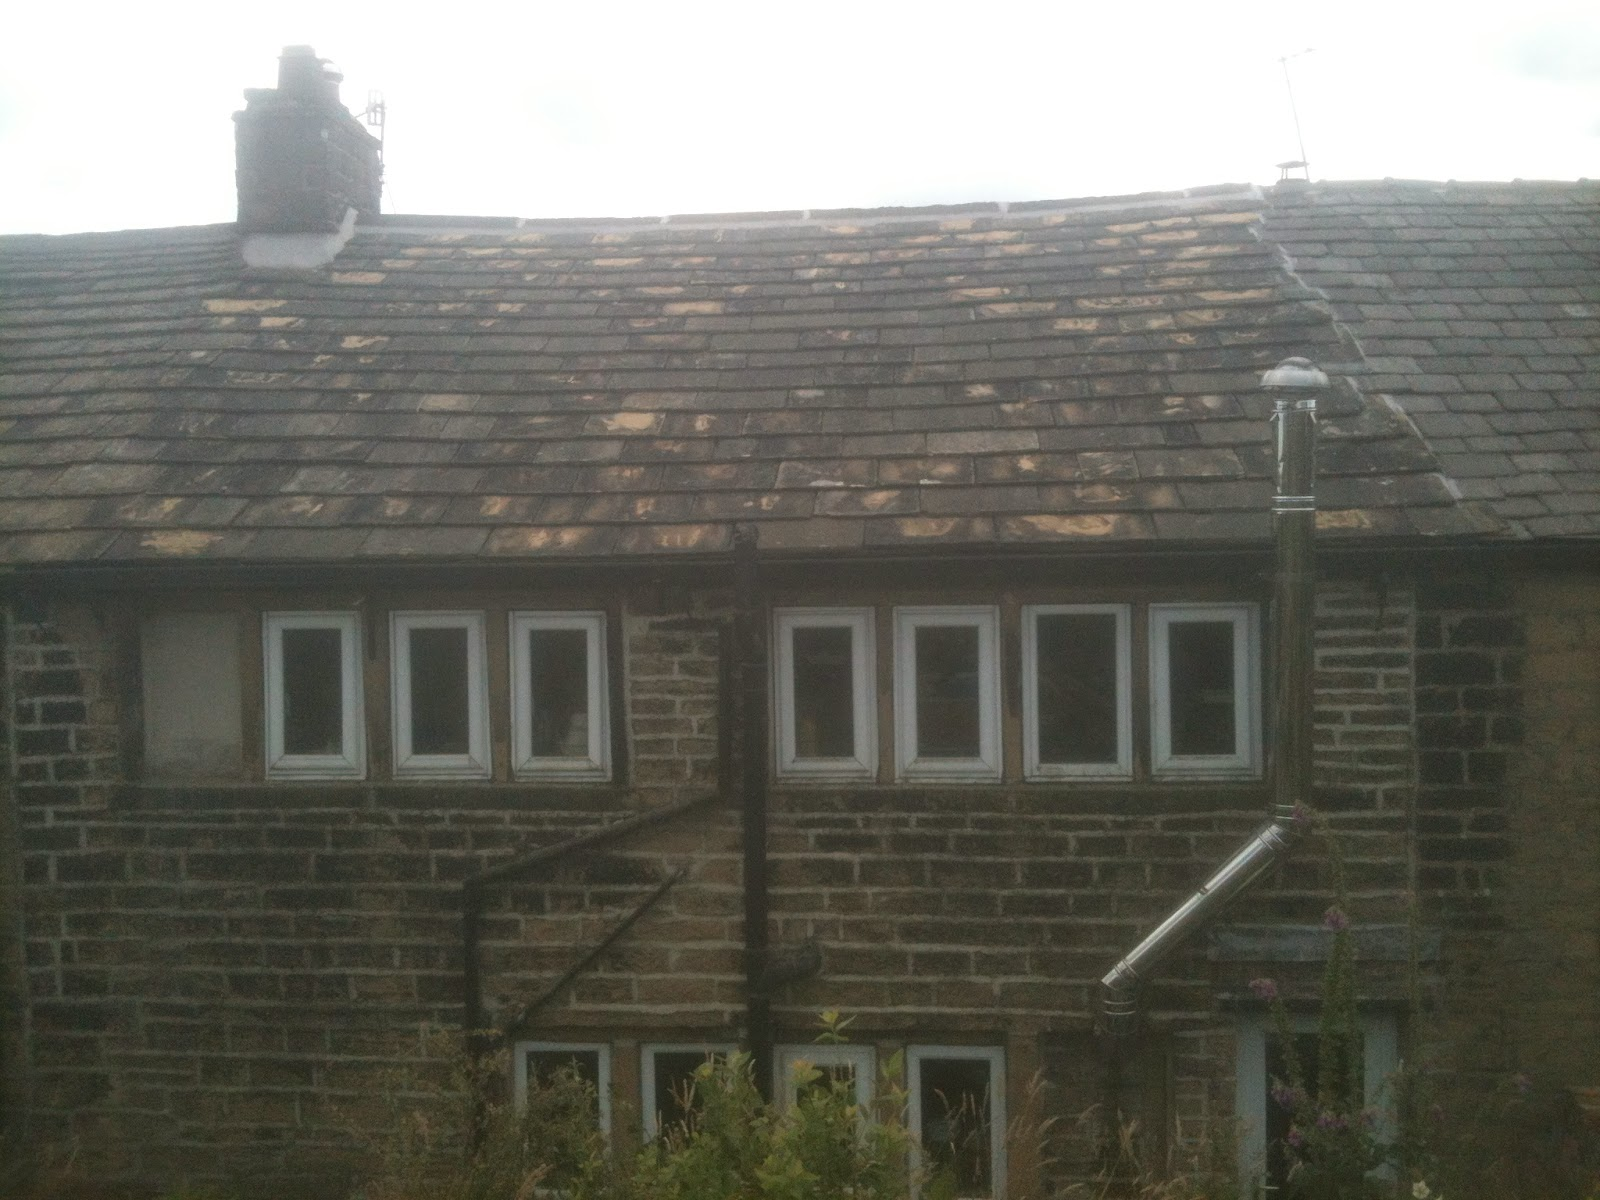 New roofs, new interiors, old secrets #lifeonpigrow